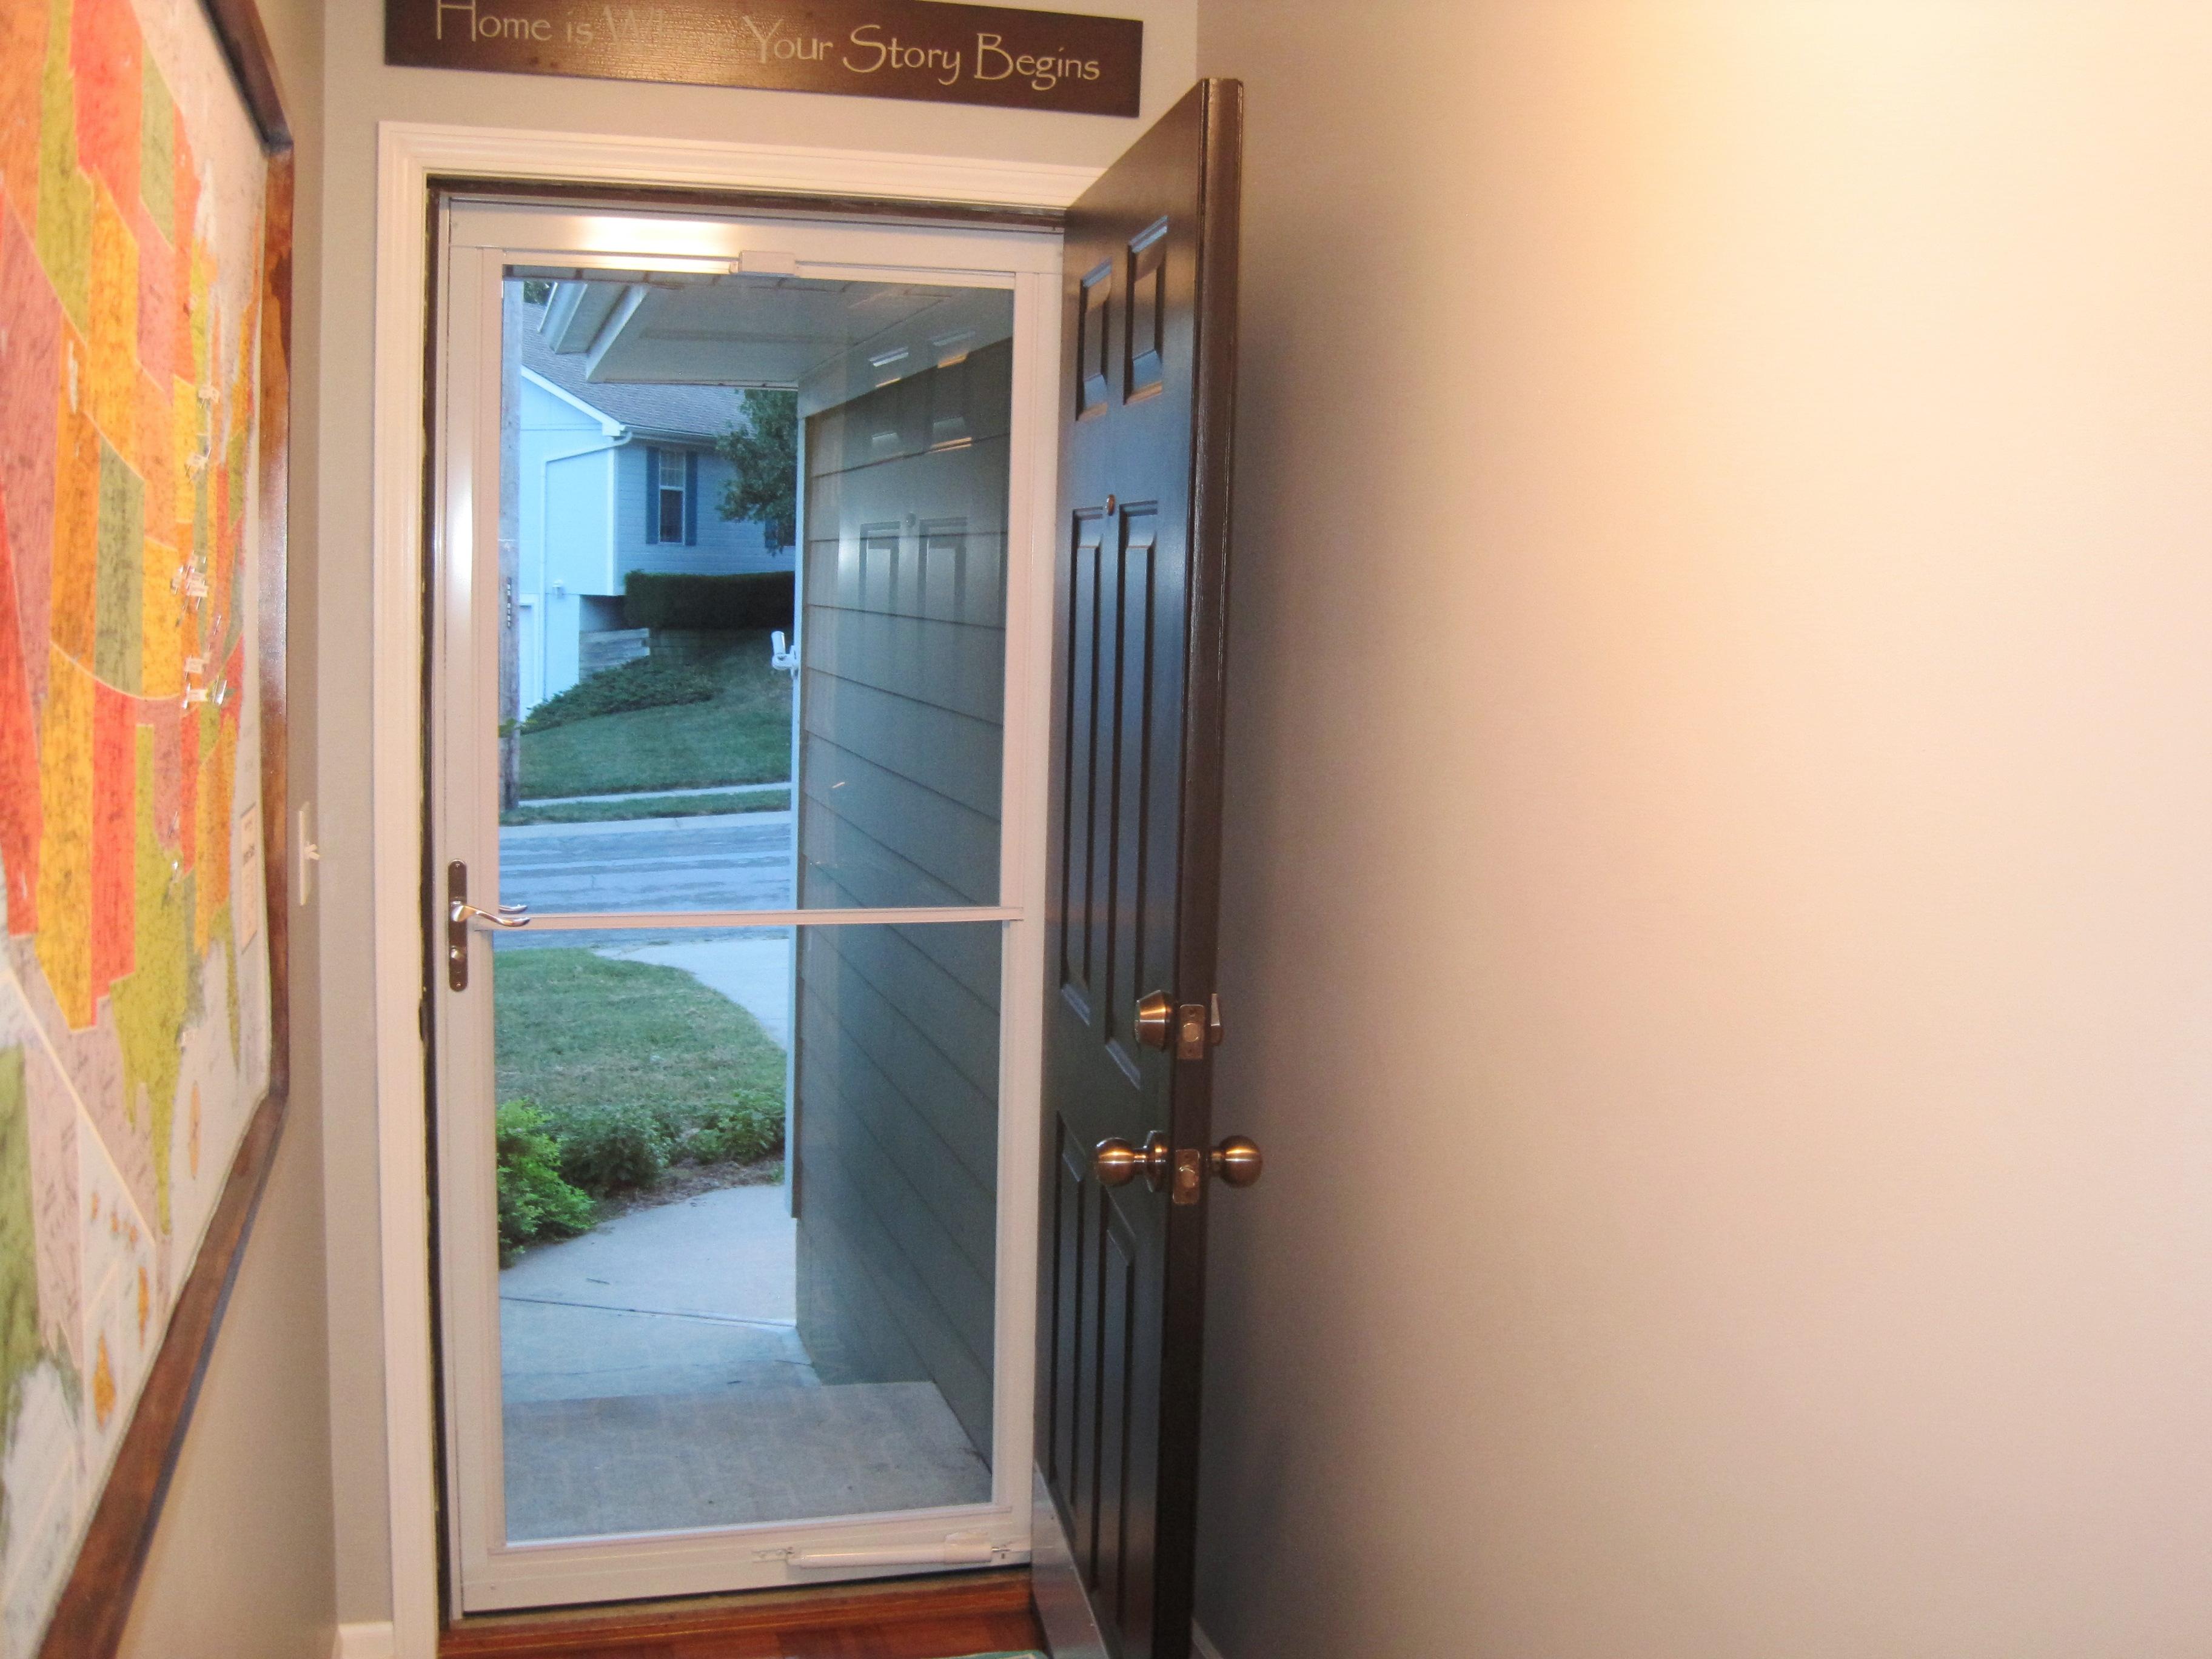 Storm Doors With Screens Disappearing : Diwyatt replacing the storm door part loving here